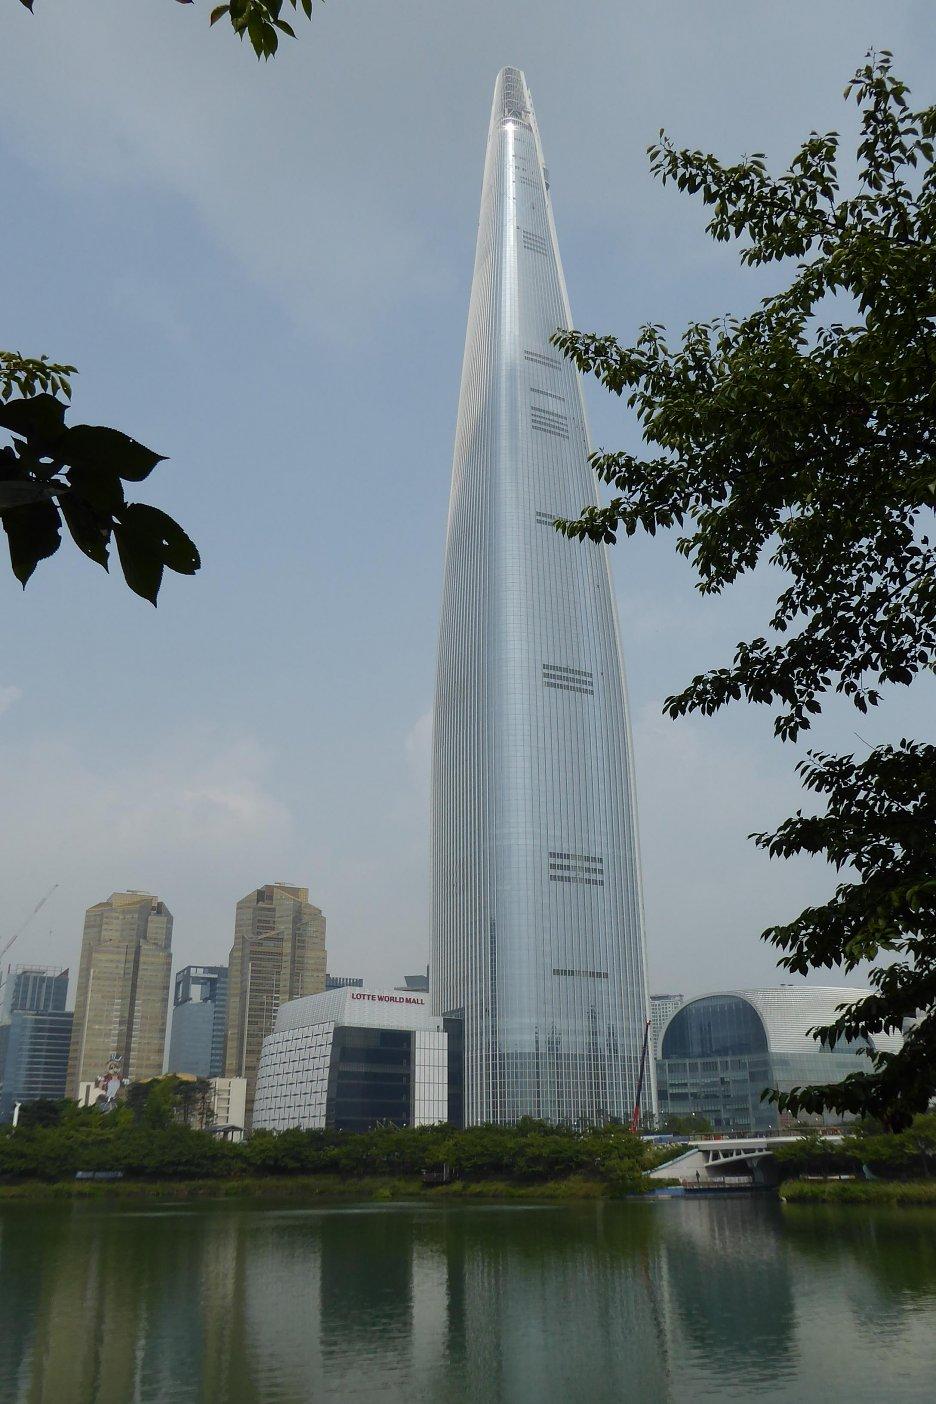 LOTTE WORLD TOWER – 555 m supervysoký mrakodrap so 123 podlažiami, najvyšší t.č. v krajinách OECD, s LED panelmi na fasáde, dokončený v marci 2016